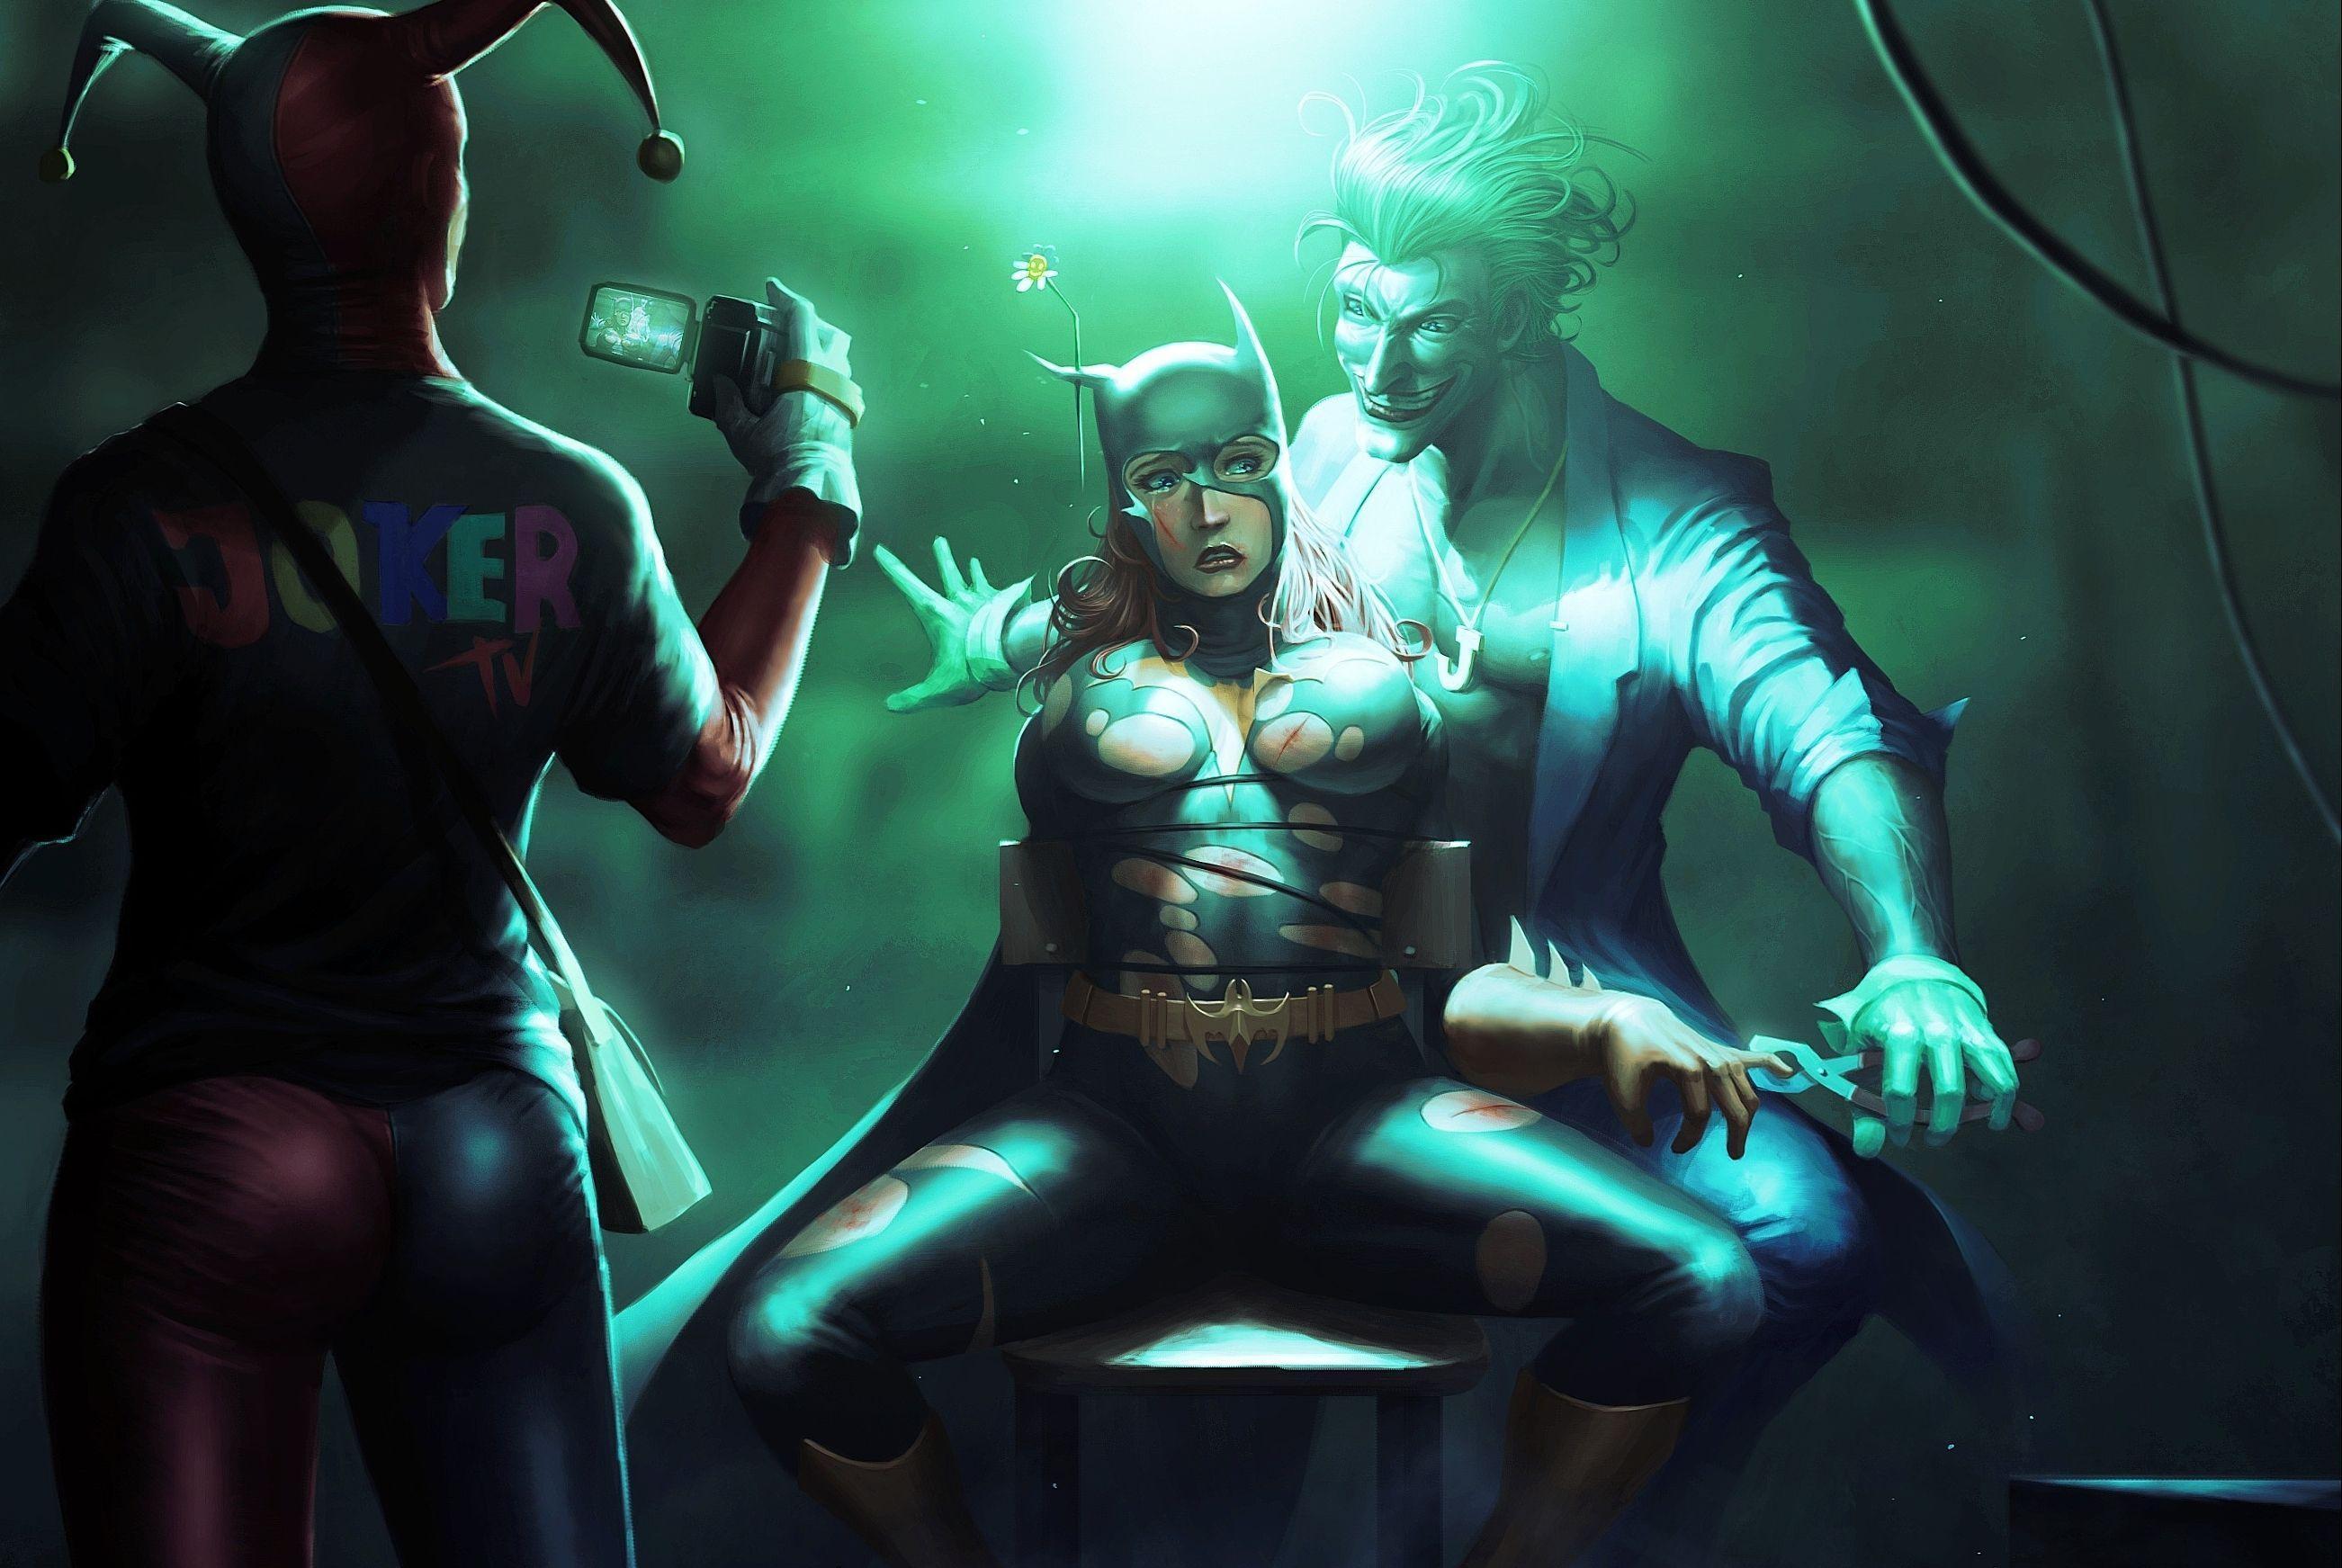 Joker And Harley Quinn Wallpapers Top Free Joker And Harley Quinn